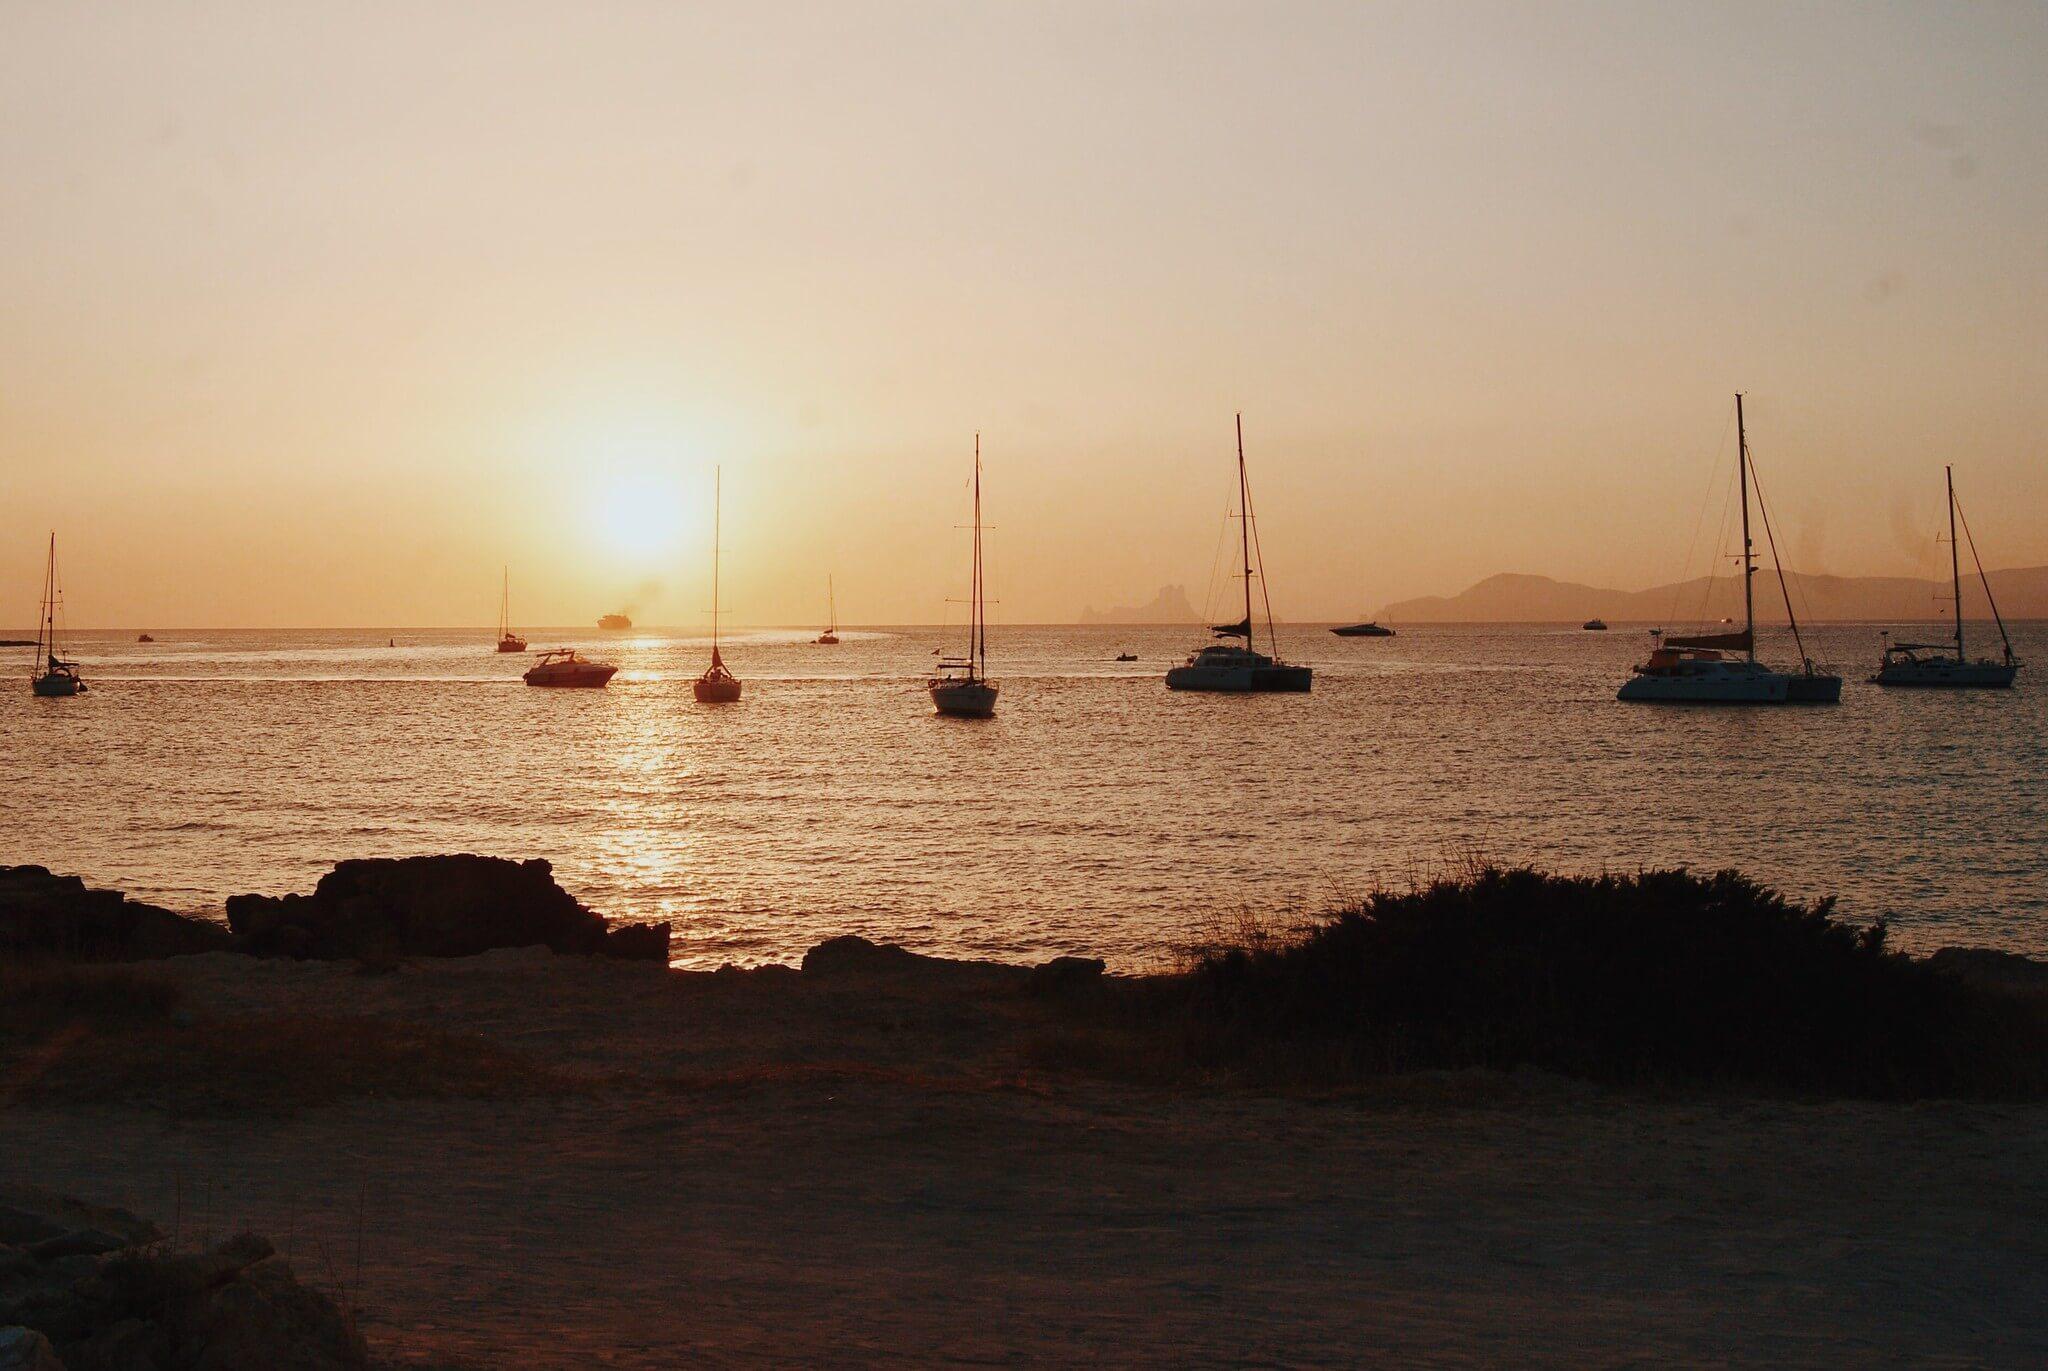 https://www.white-ibiza.com/wp-content/uploads/2020/03/formentera-sunsets-2020-08.jpg